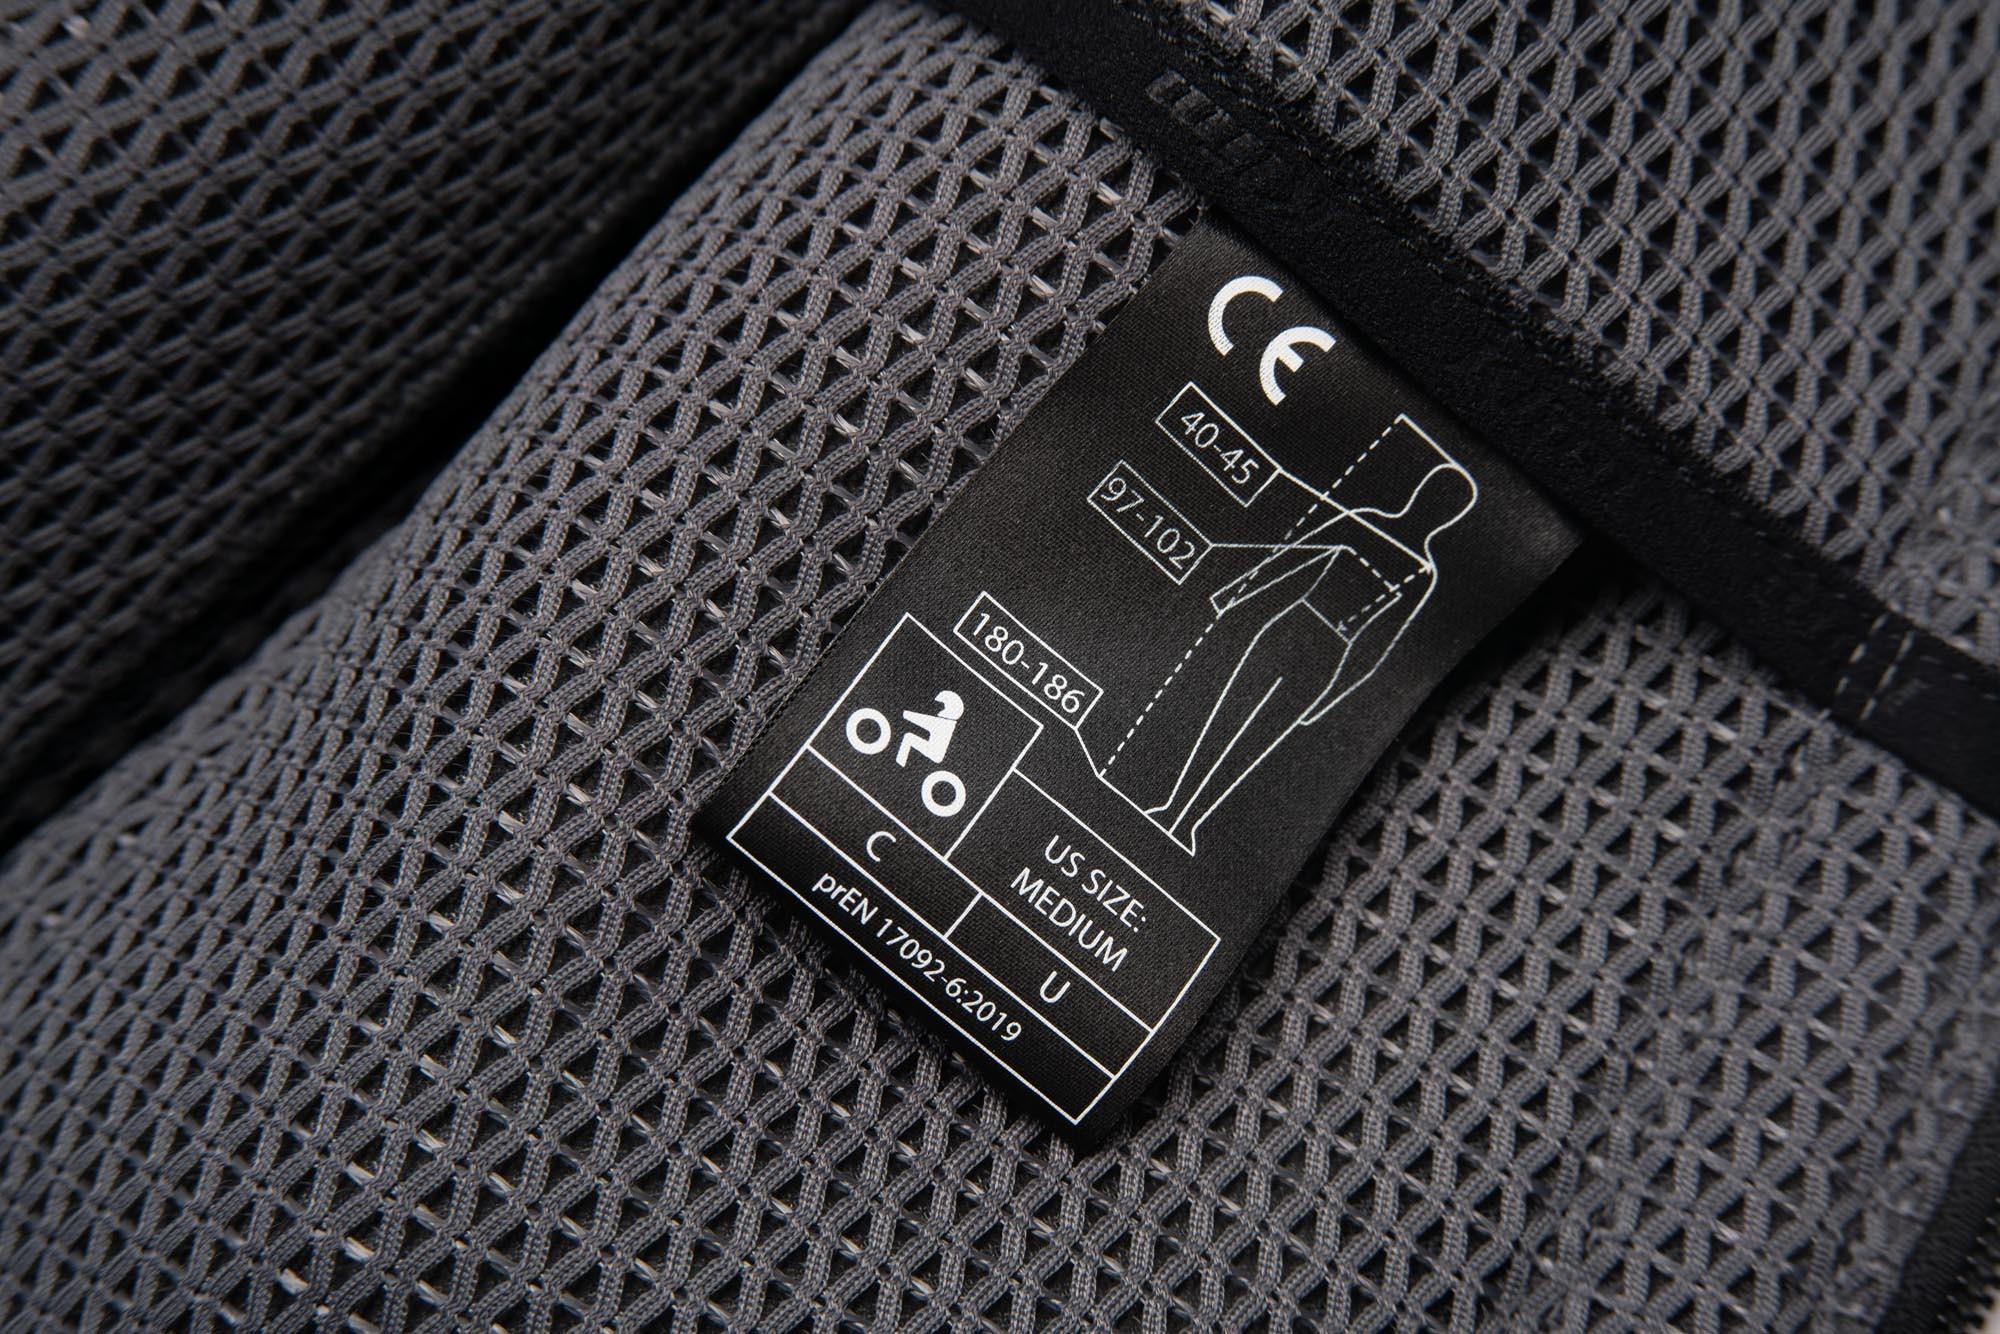 CE level 1 label for Klim Ai-1 airbag vest